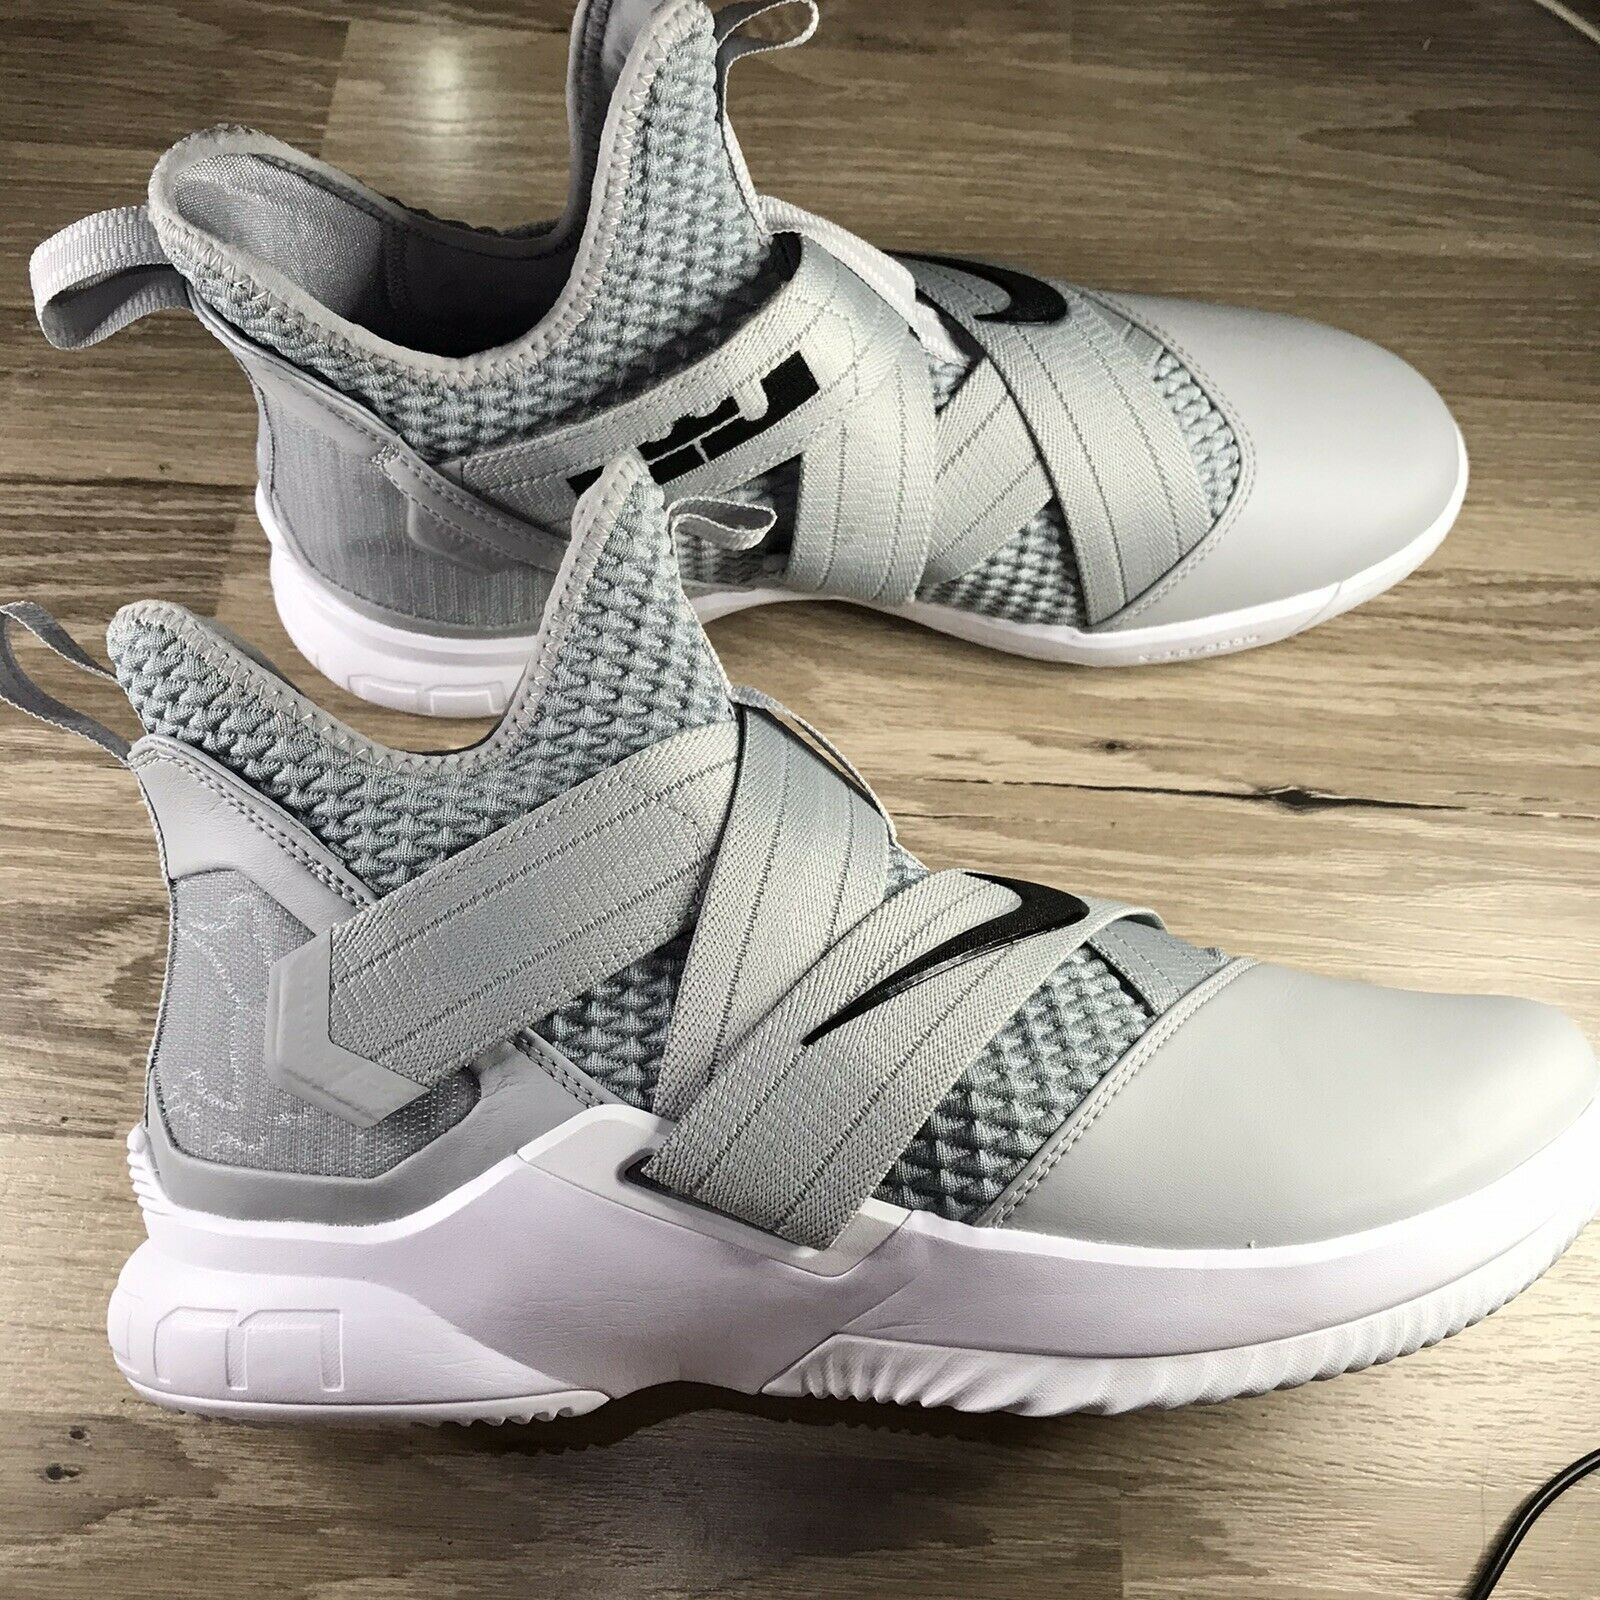 Nike Lebron Soldier XII TB Zoom Grey